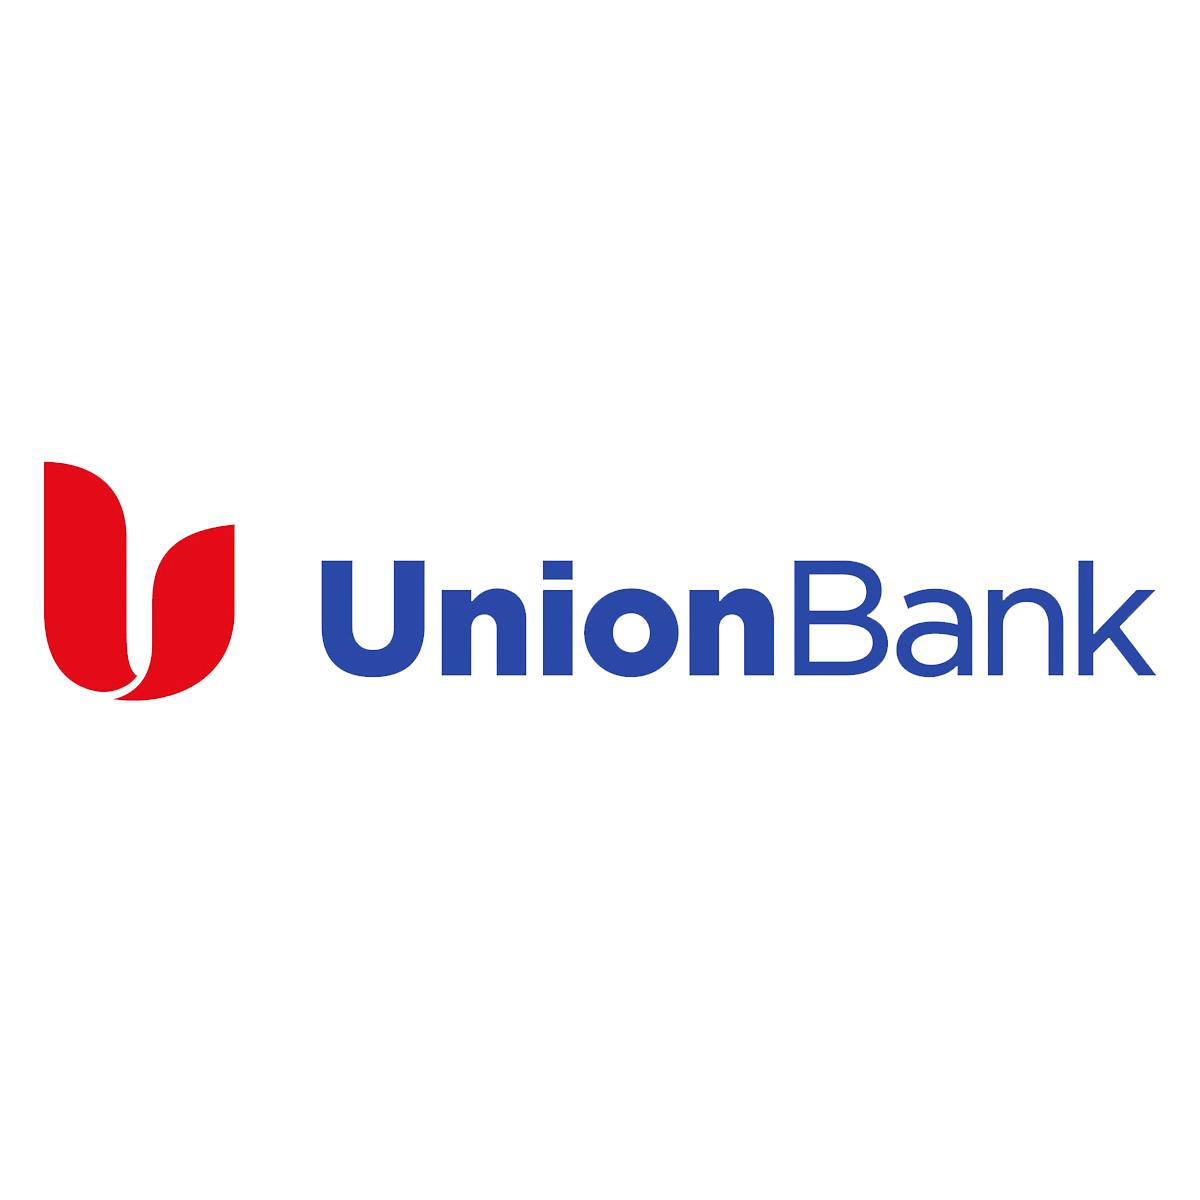 B2B Brand Logos_0010_UNION_BANK_LOGO_-_NEW_2012.jpg